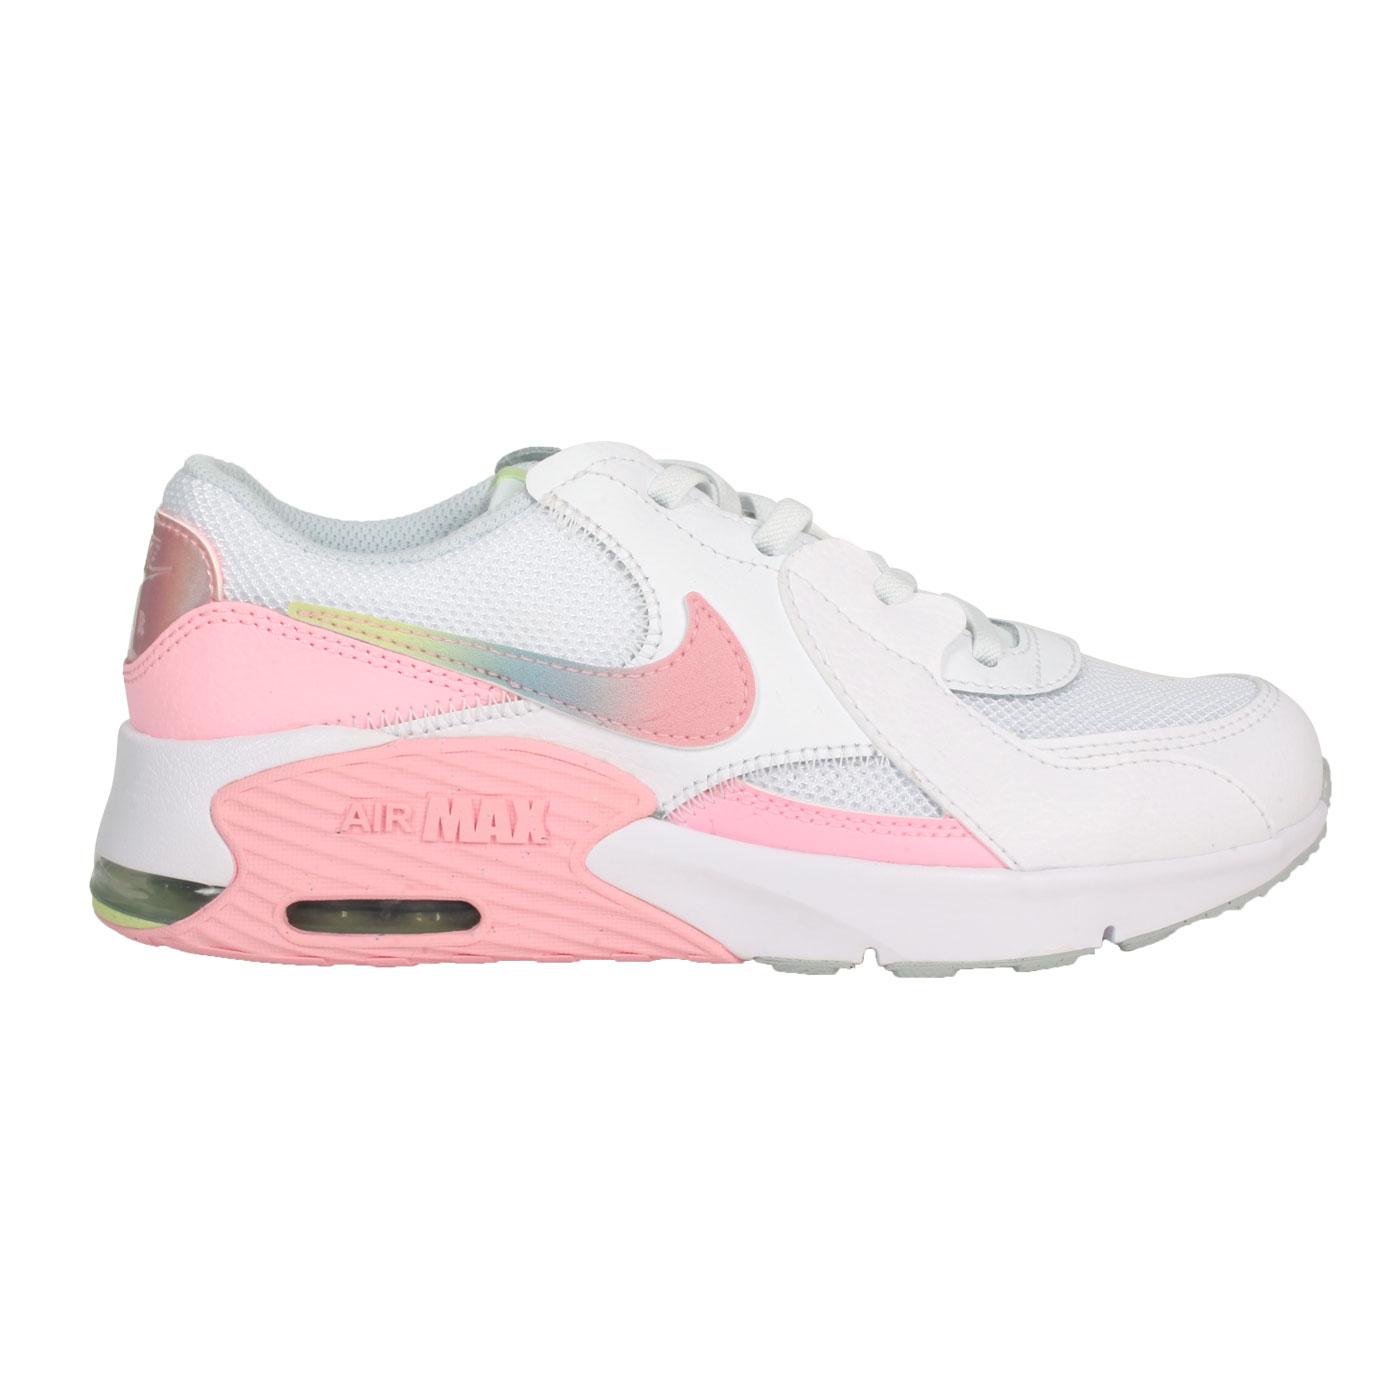 NIKE 中童休閒運動鞋  @AIR MAX EXCEE MWH(PS)@CW5832100 - 白粉綠